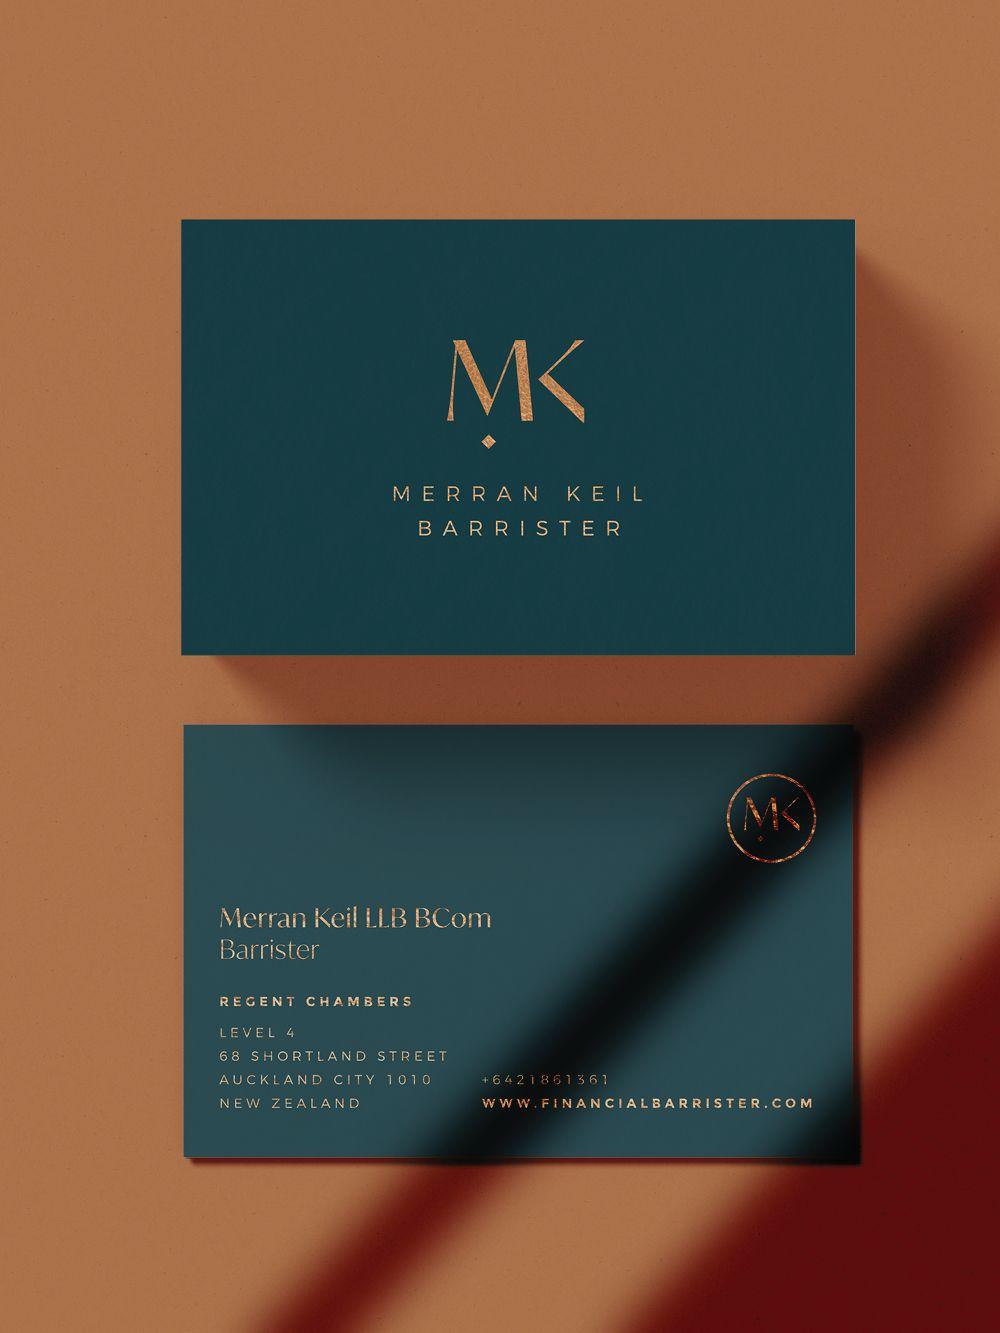 Copper Foil Business Cards Professional Business Card Design Business Card Design Simple Graphic Design Business Card